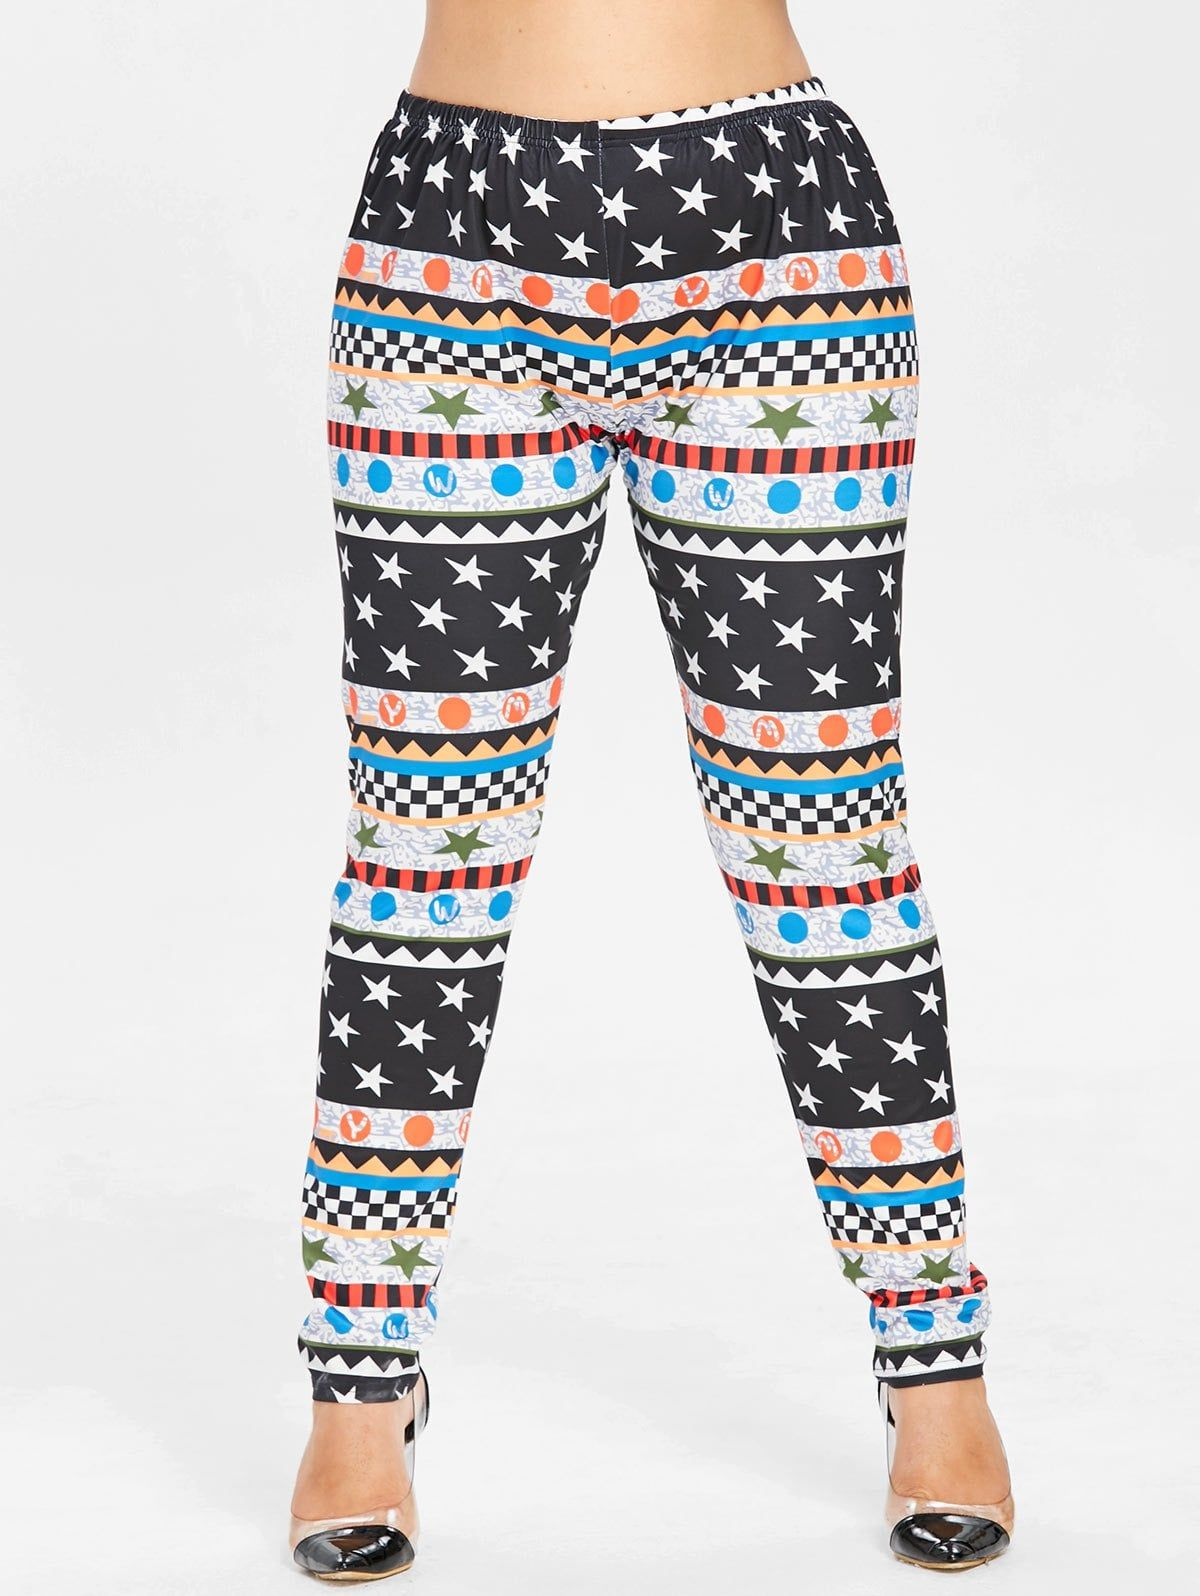 Plus Size Christmas Leggings.Womens Plus Size Graphic Christmas Leggings Multi